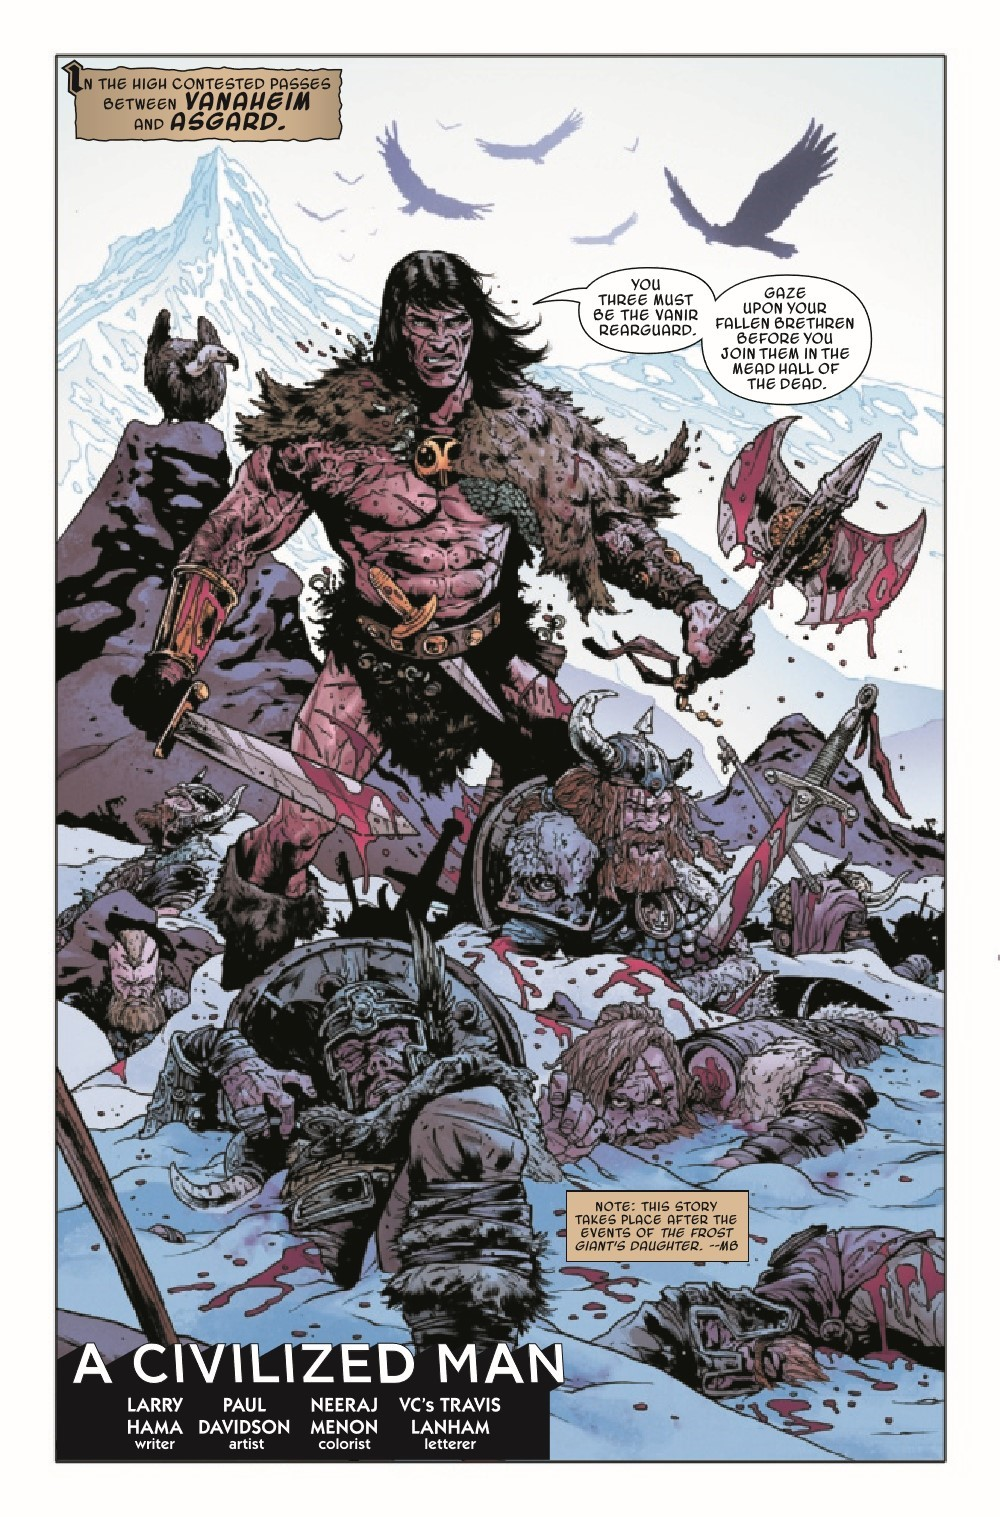 CONANBARB2019025_Preview-5 ComicList Previews: CONAN THE BARBARIAN #25